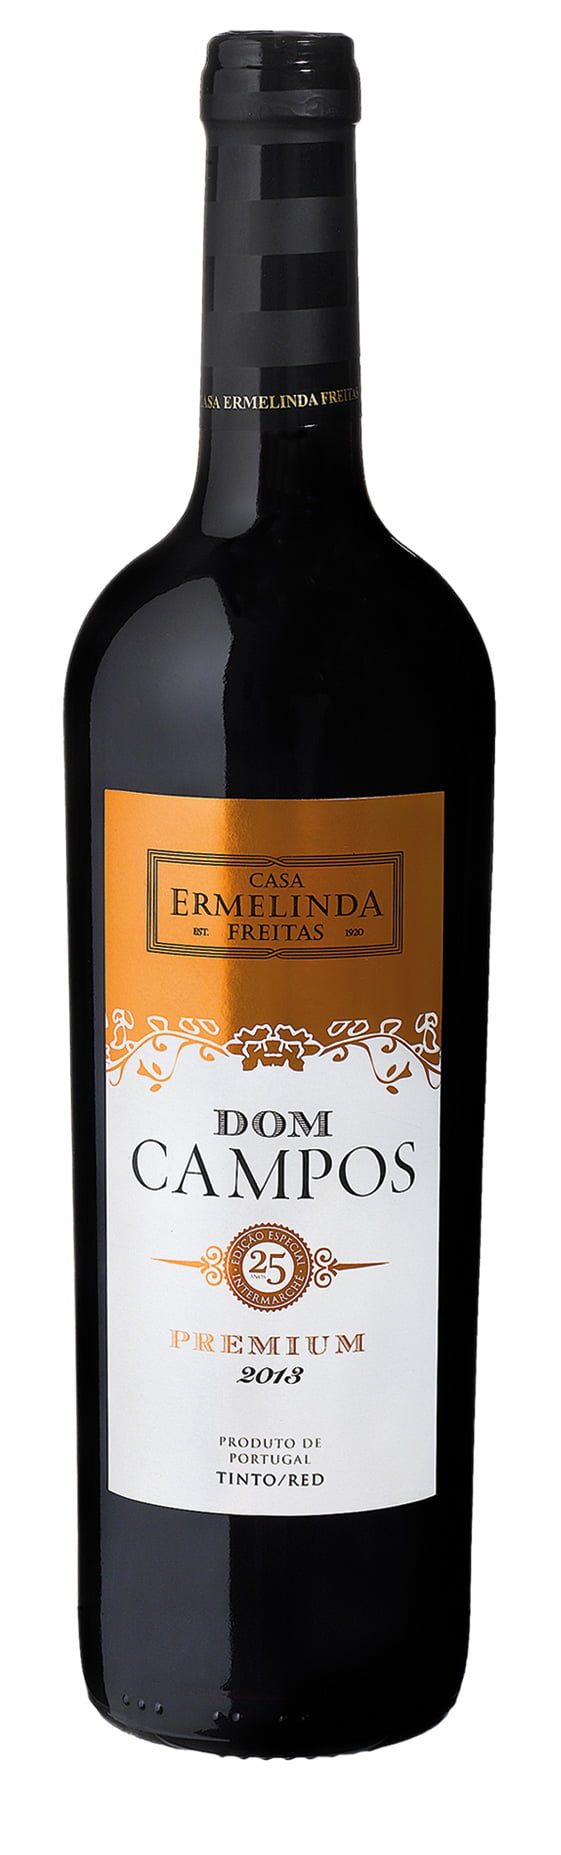 Dom Campos